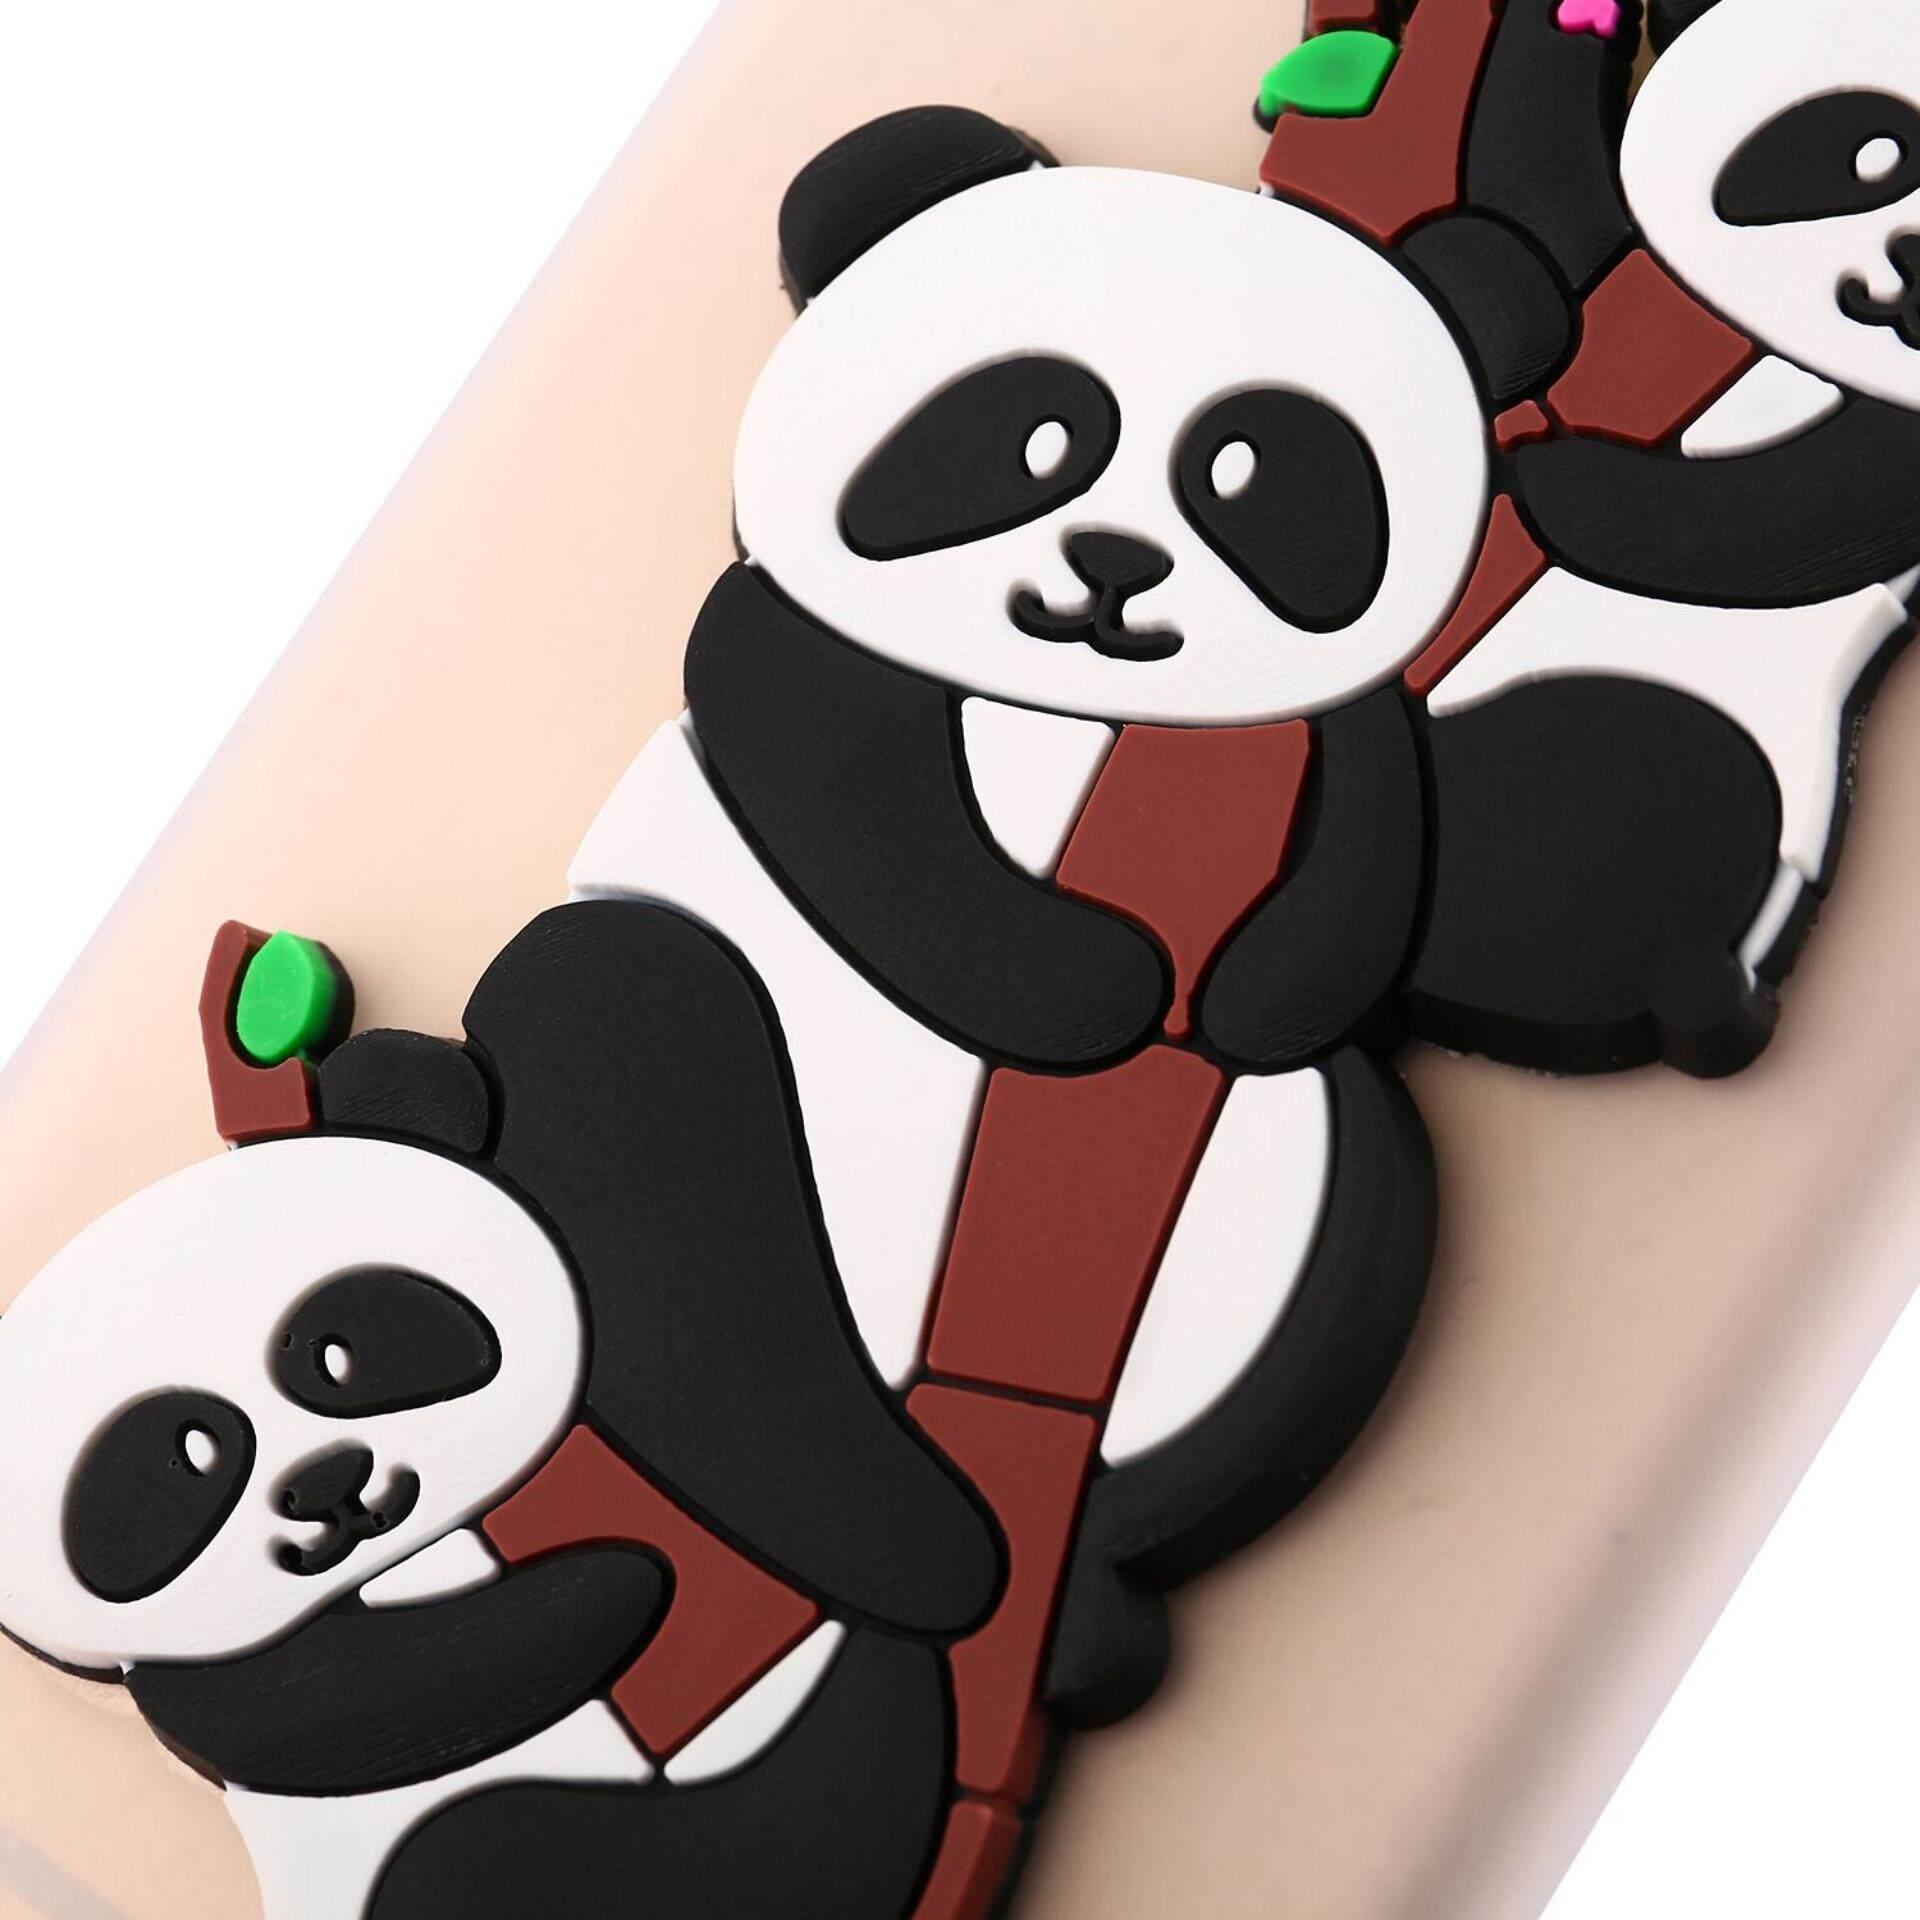 Gambar Kartun Panda Lucu